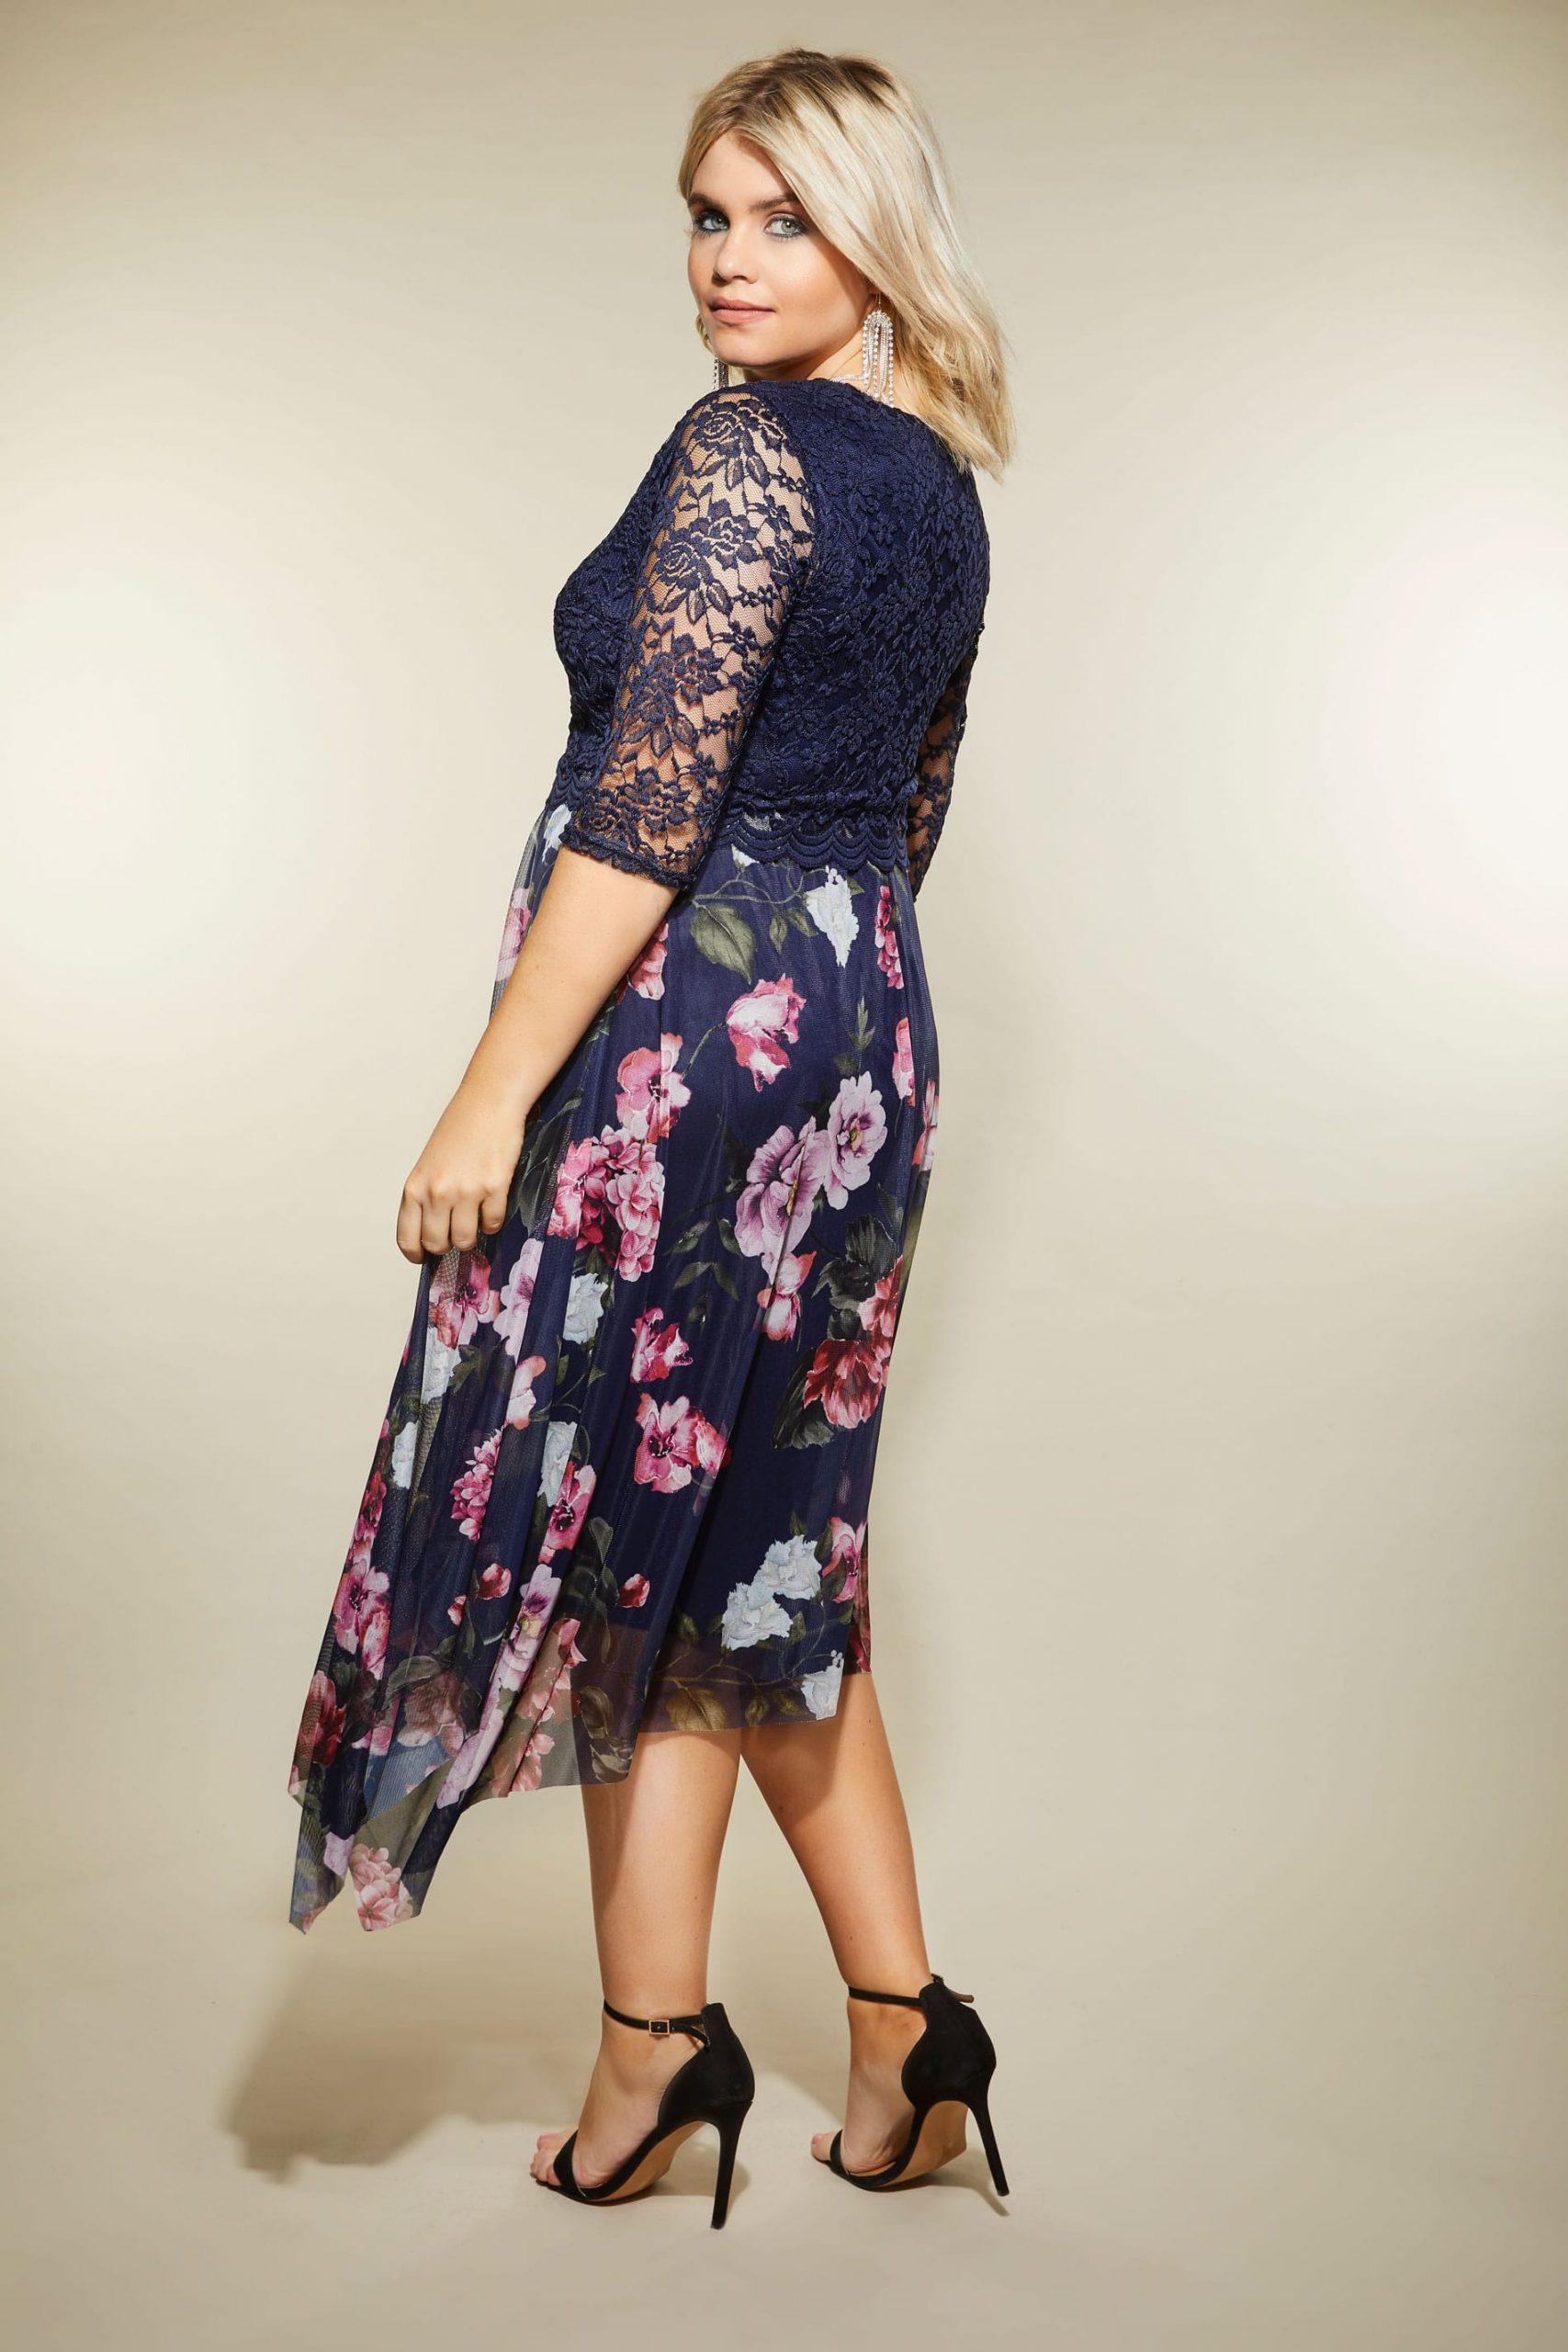 Yours London Navyblaues  Pinkes Kleid Mit Blumenprint